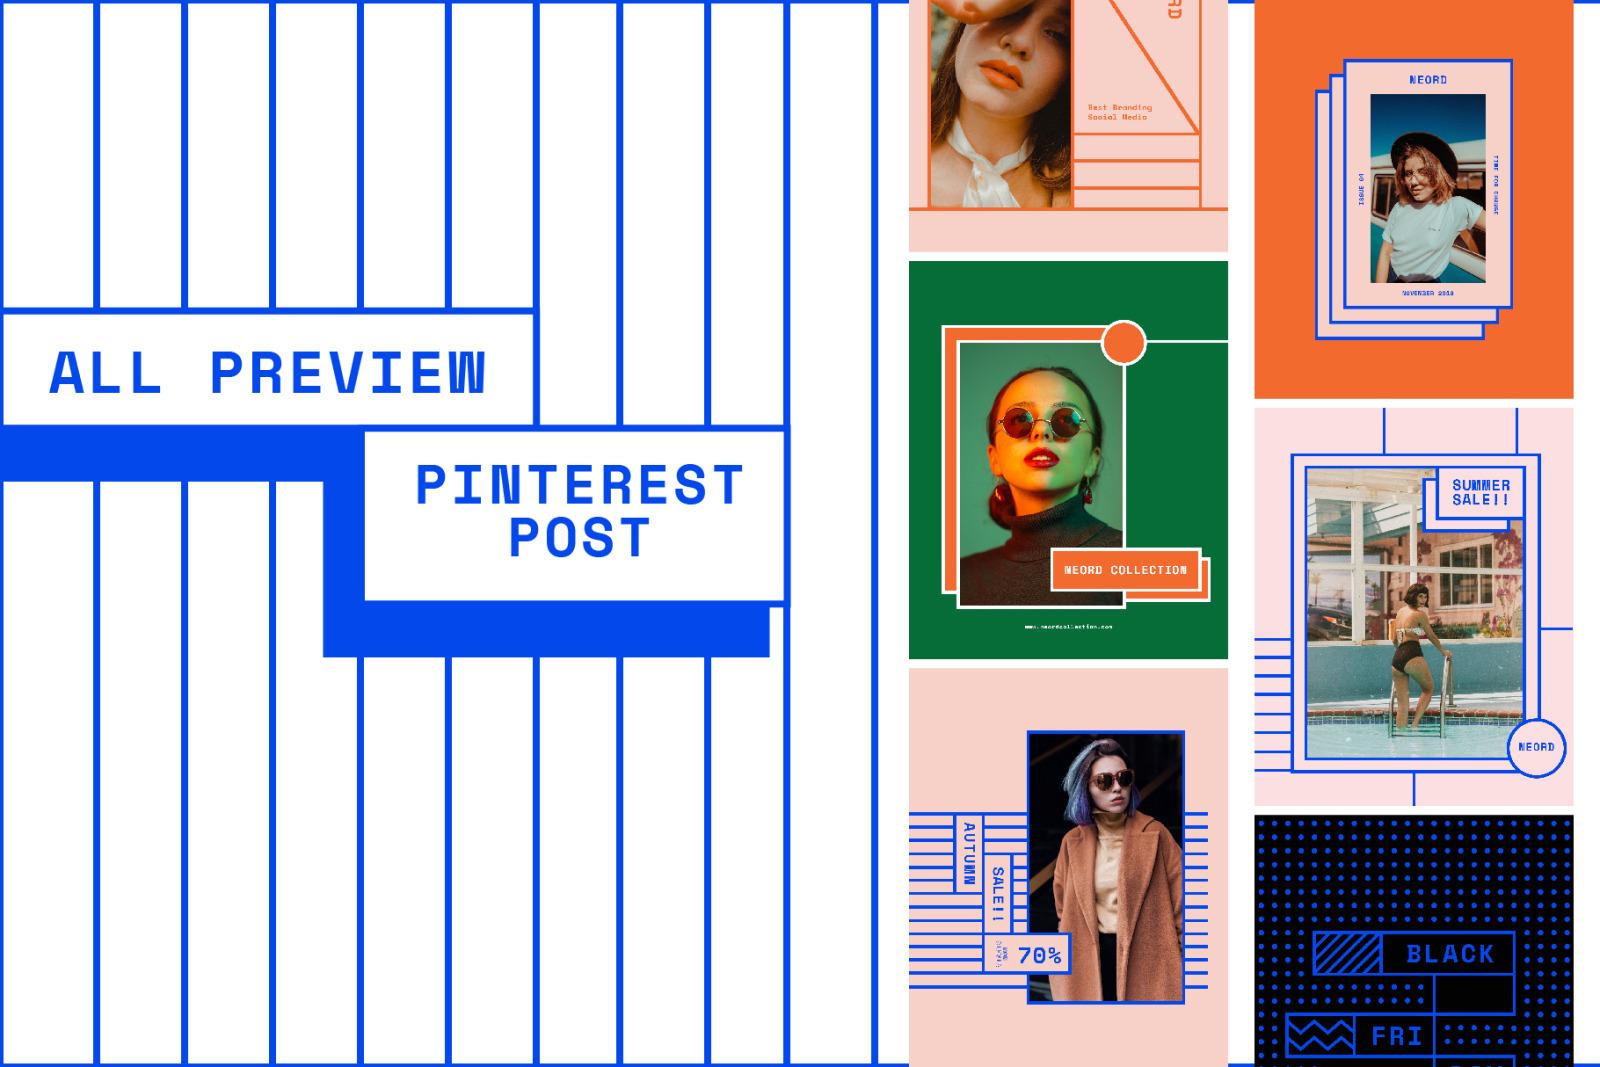 NEORD - Social Media Brand Templates